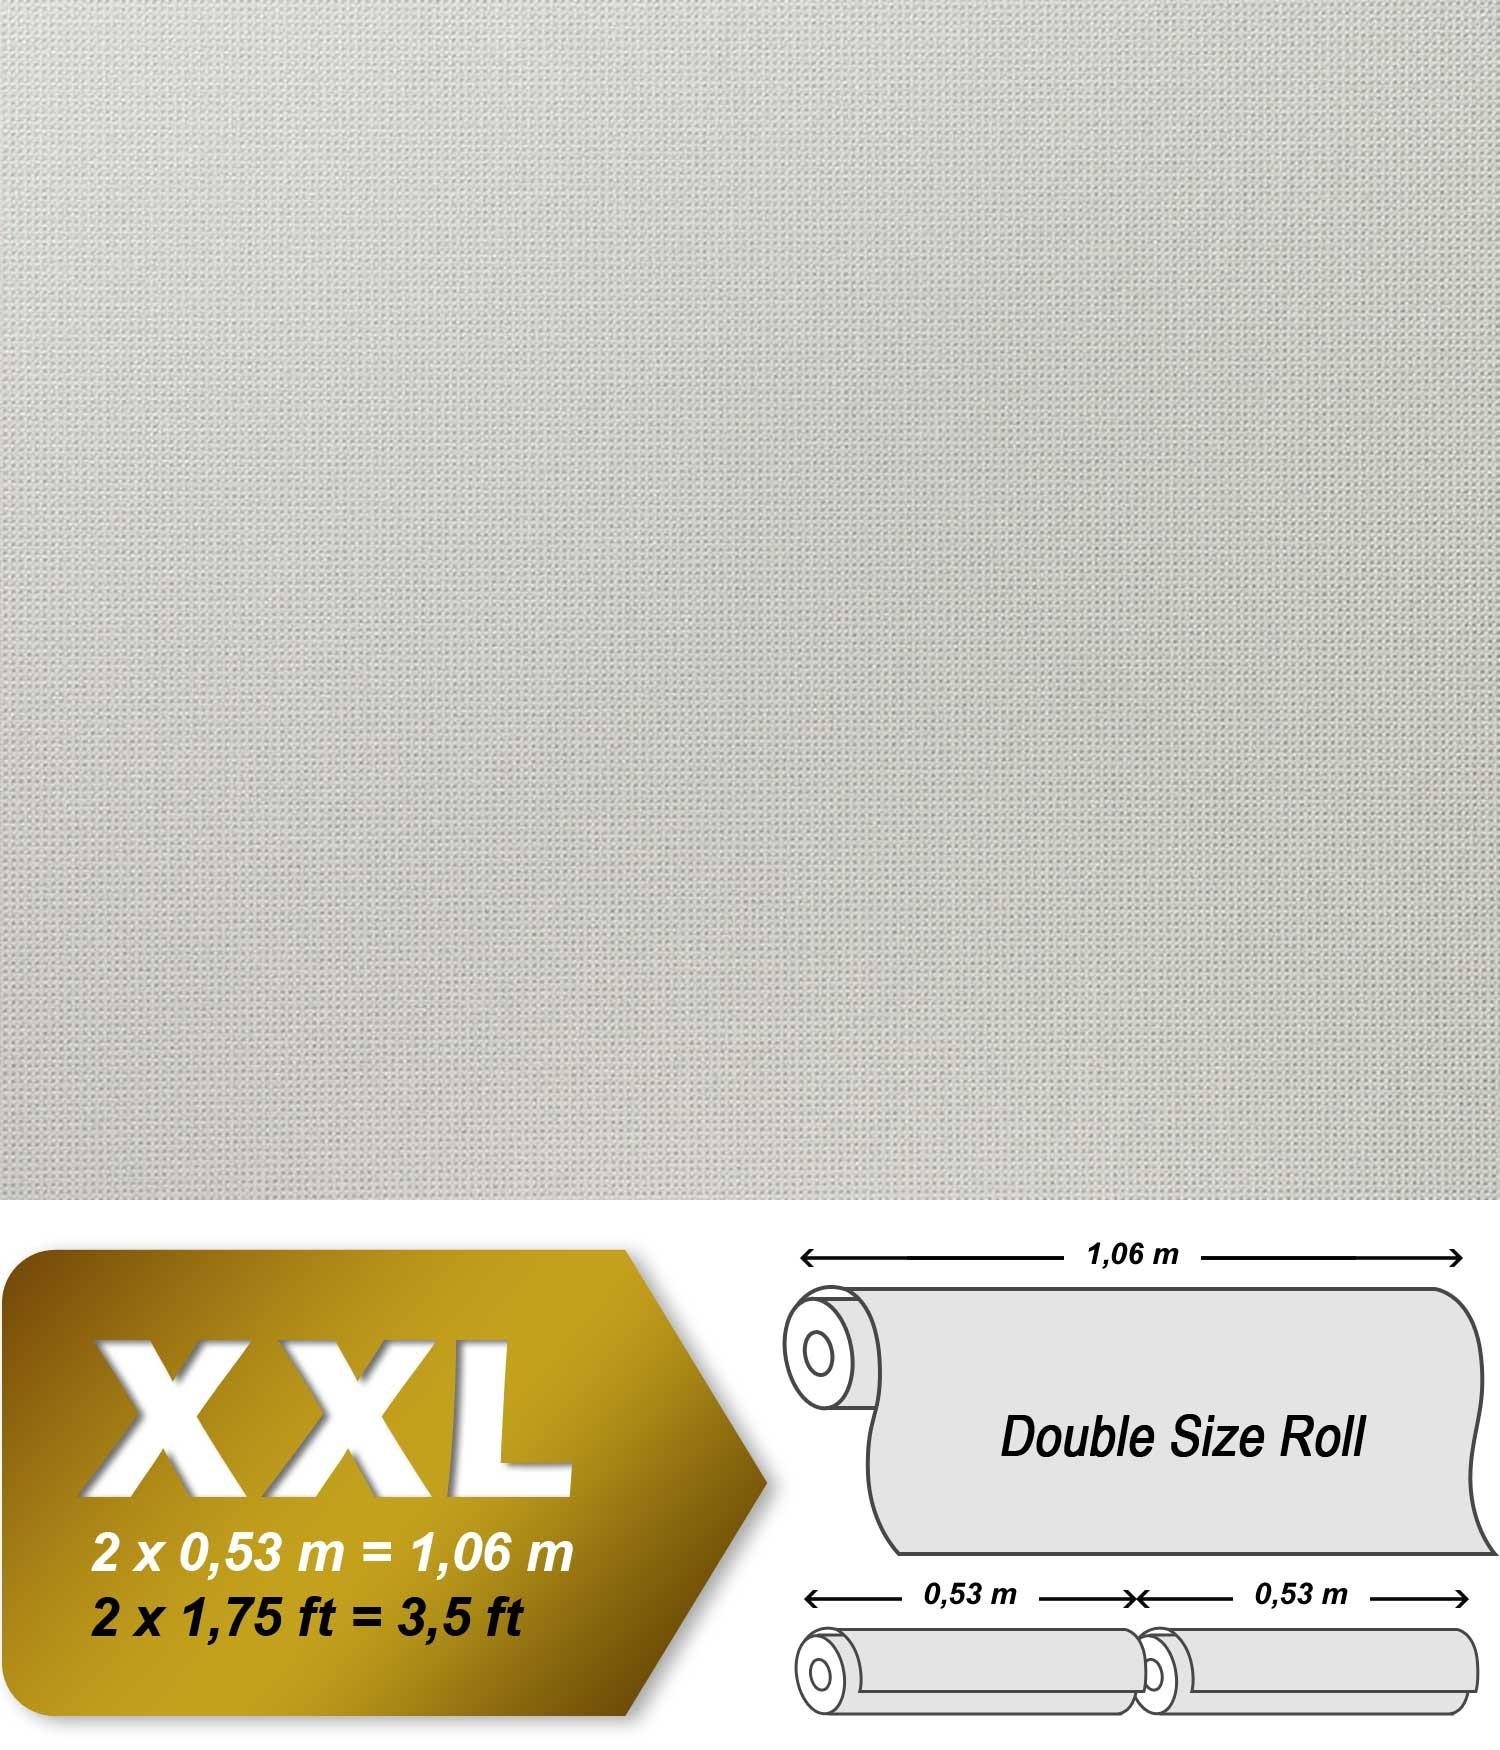 Textil Tapete Ueberstreichen : White Non Woven Fabric